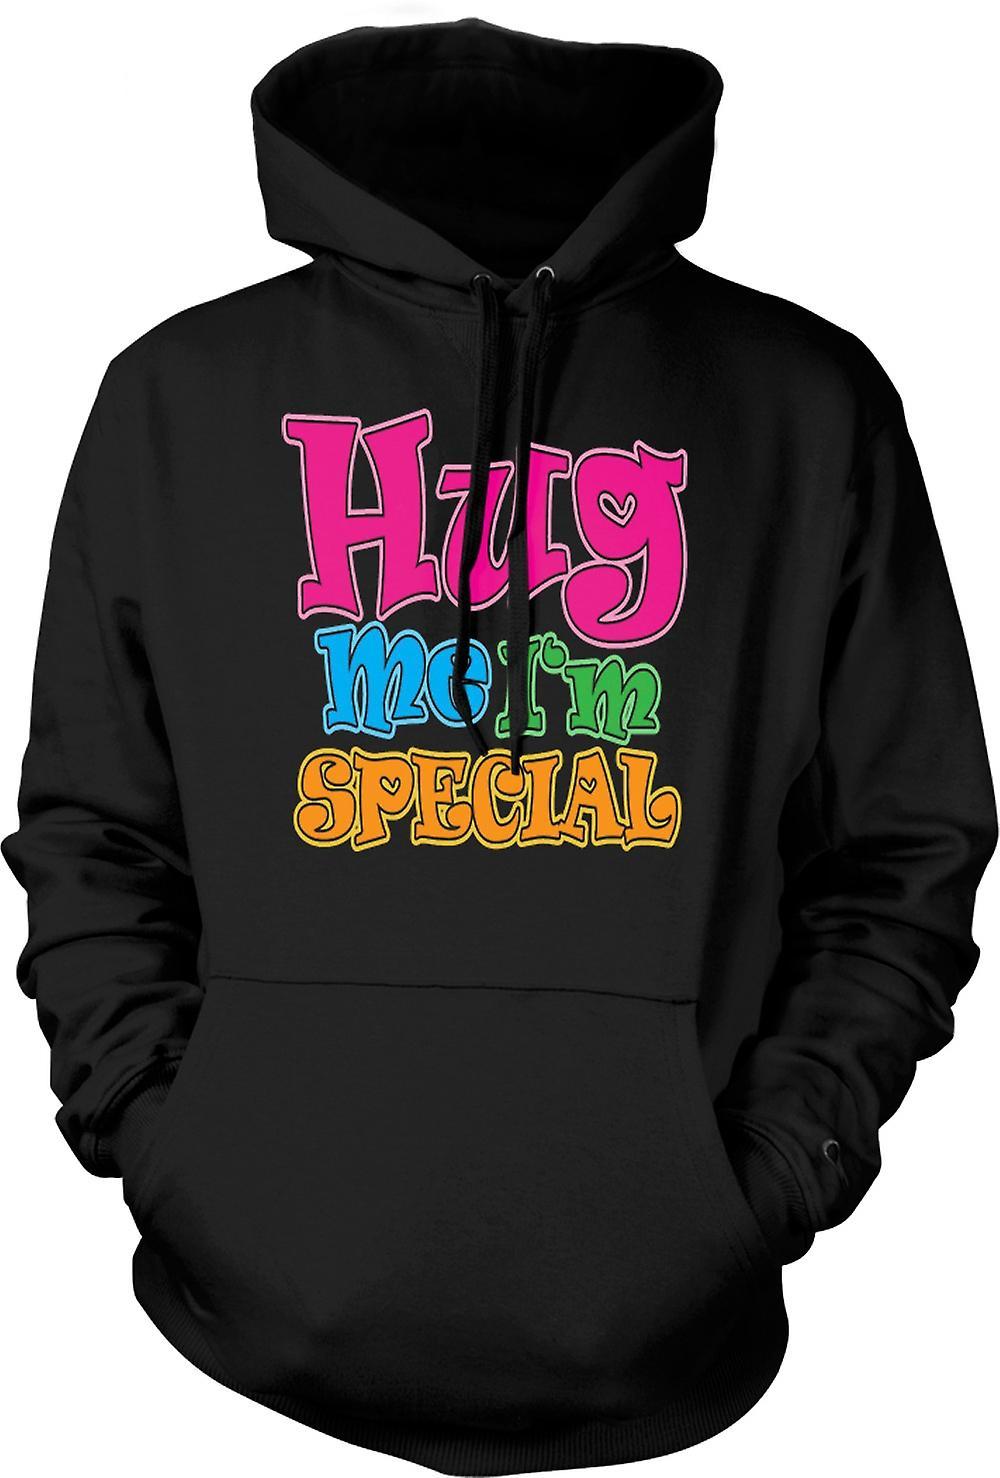 Para hombre con capucha - Me abrazo yo soy especial - gracioso